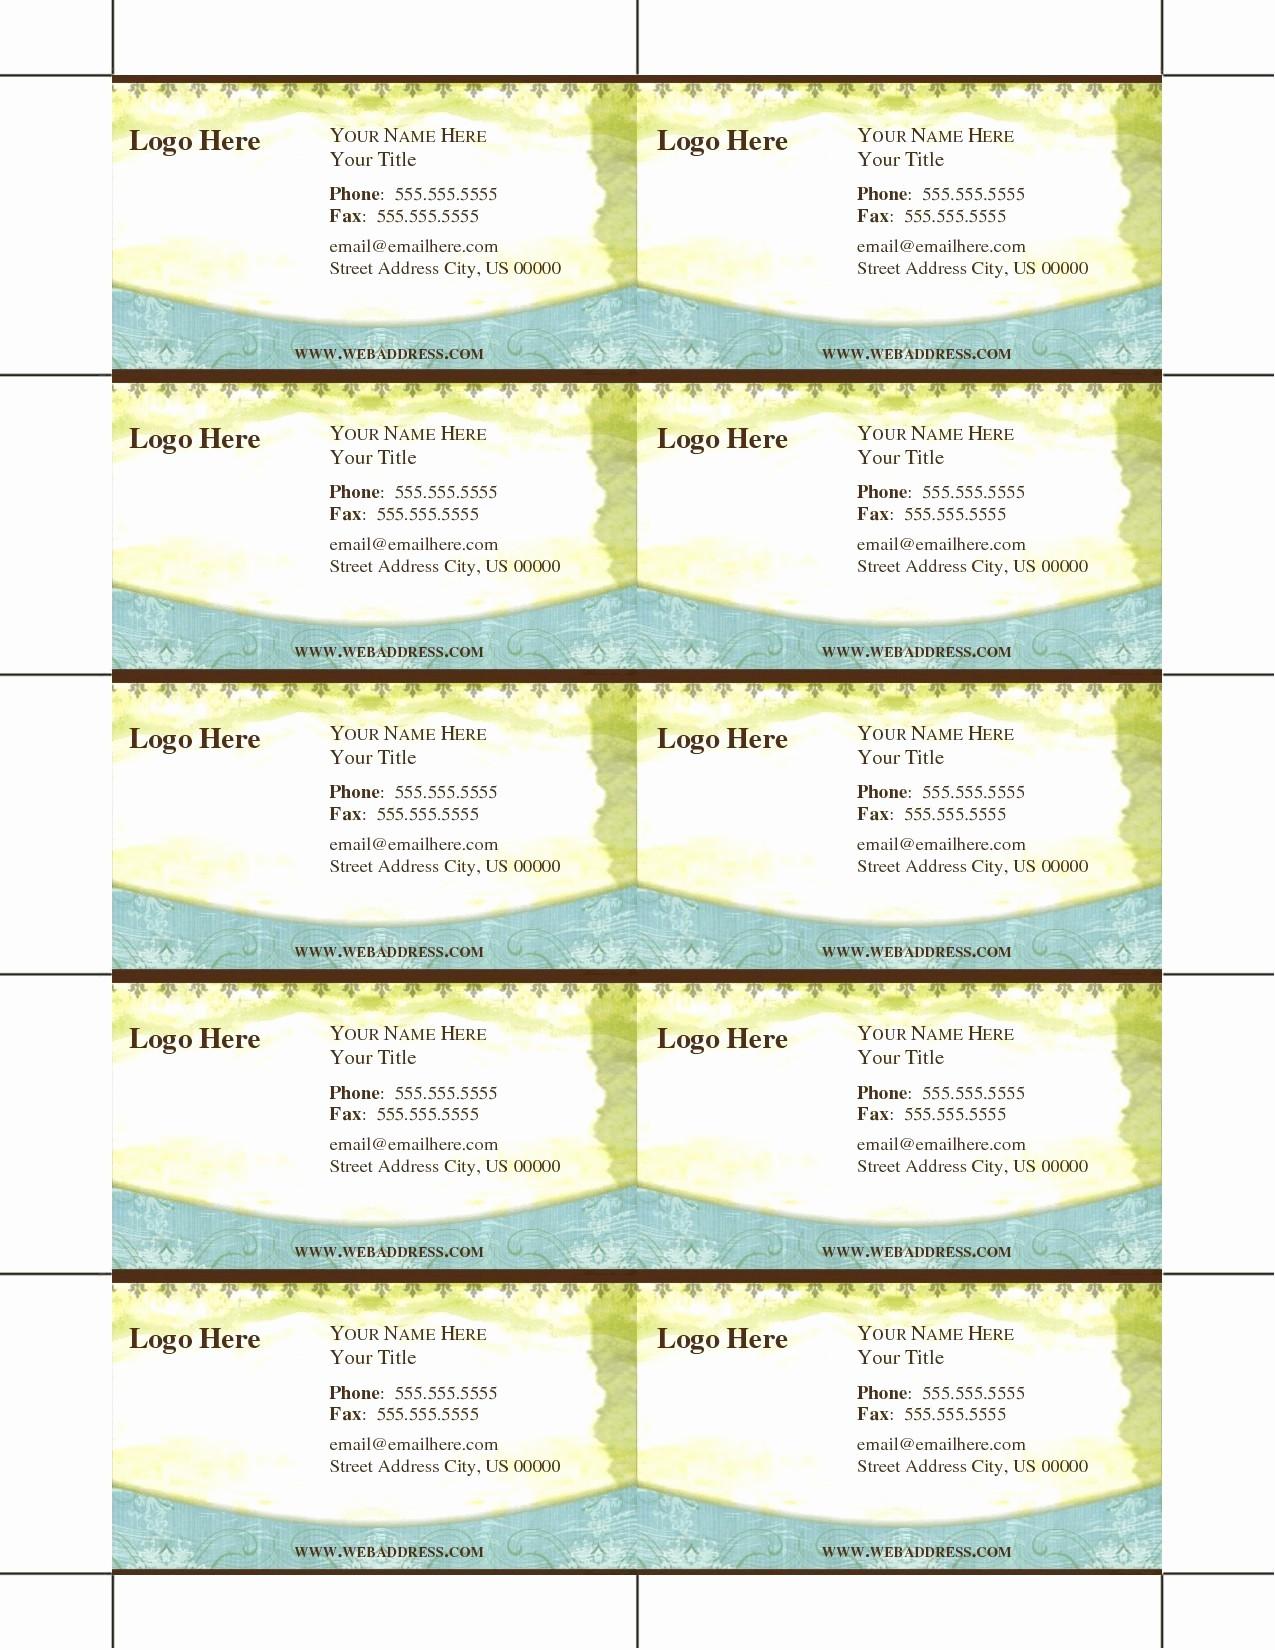 Ms Word Template Business Card Elegant Luxury Blank Business Card Template Microsoft Word